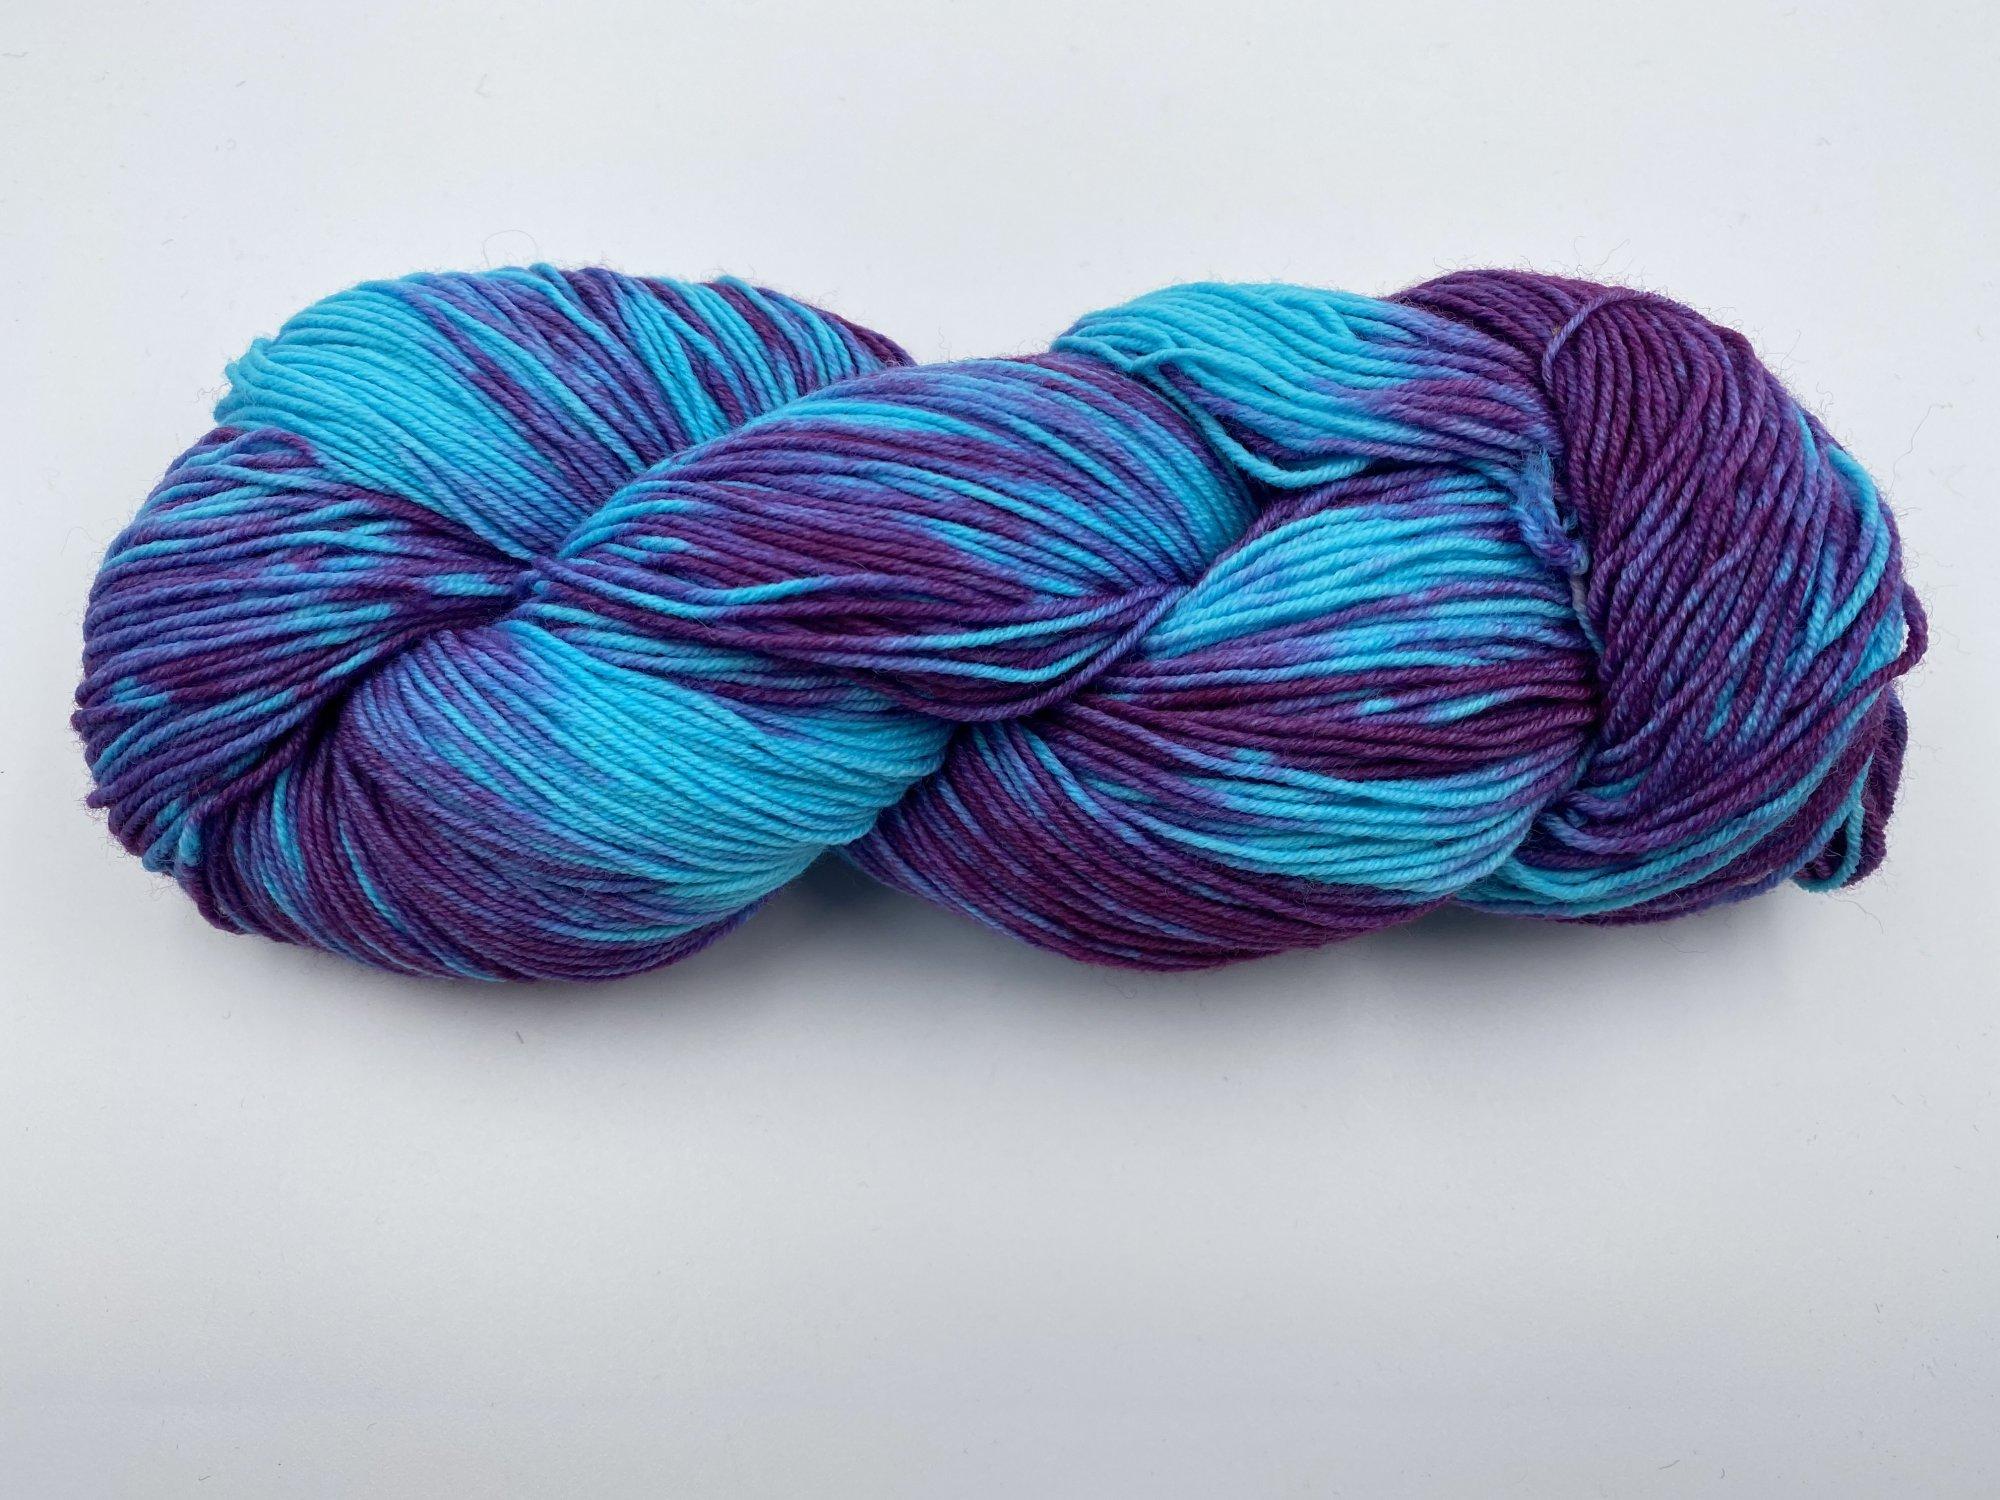 Handmaiden Fleece Artist Organic Cottage Sock - Purple Haze